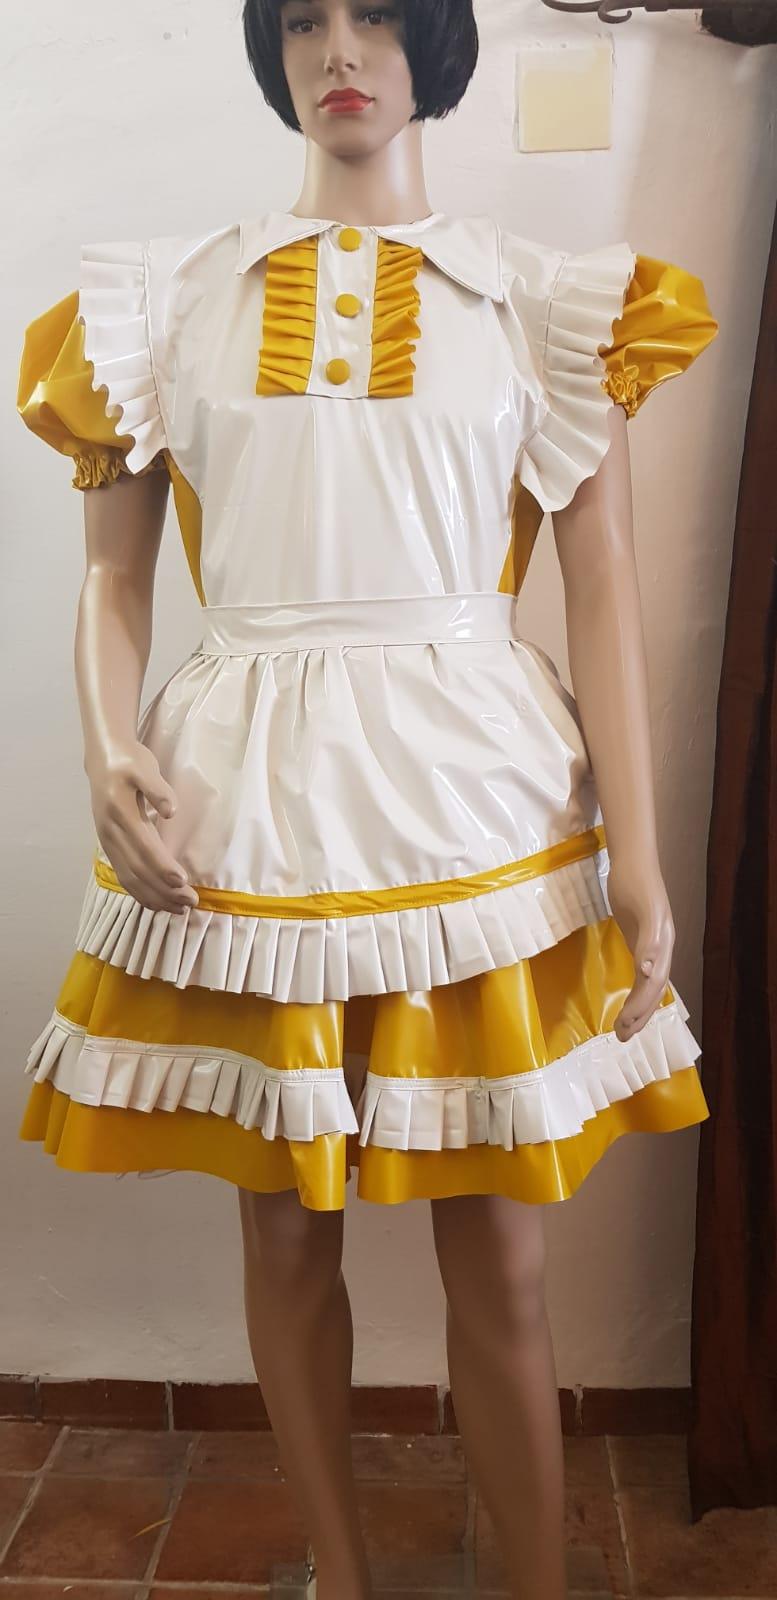 Tracy – Sissy Dress In PVC or Satin